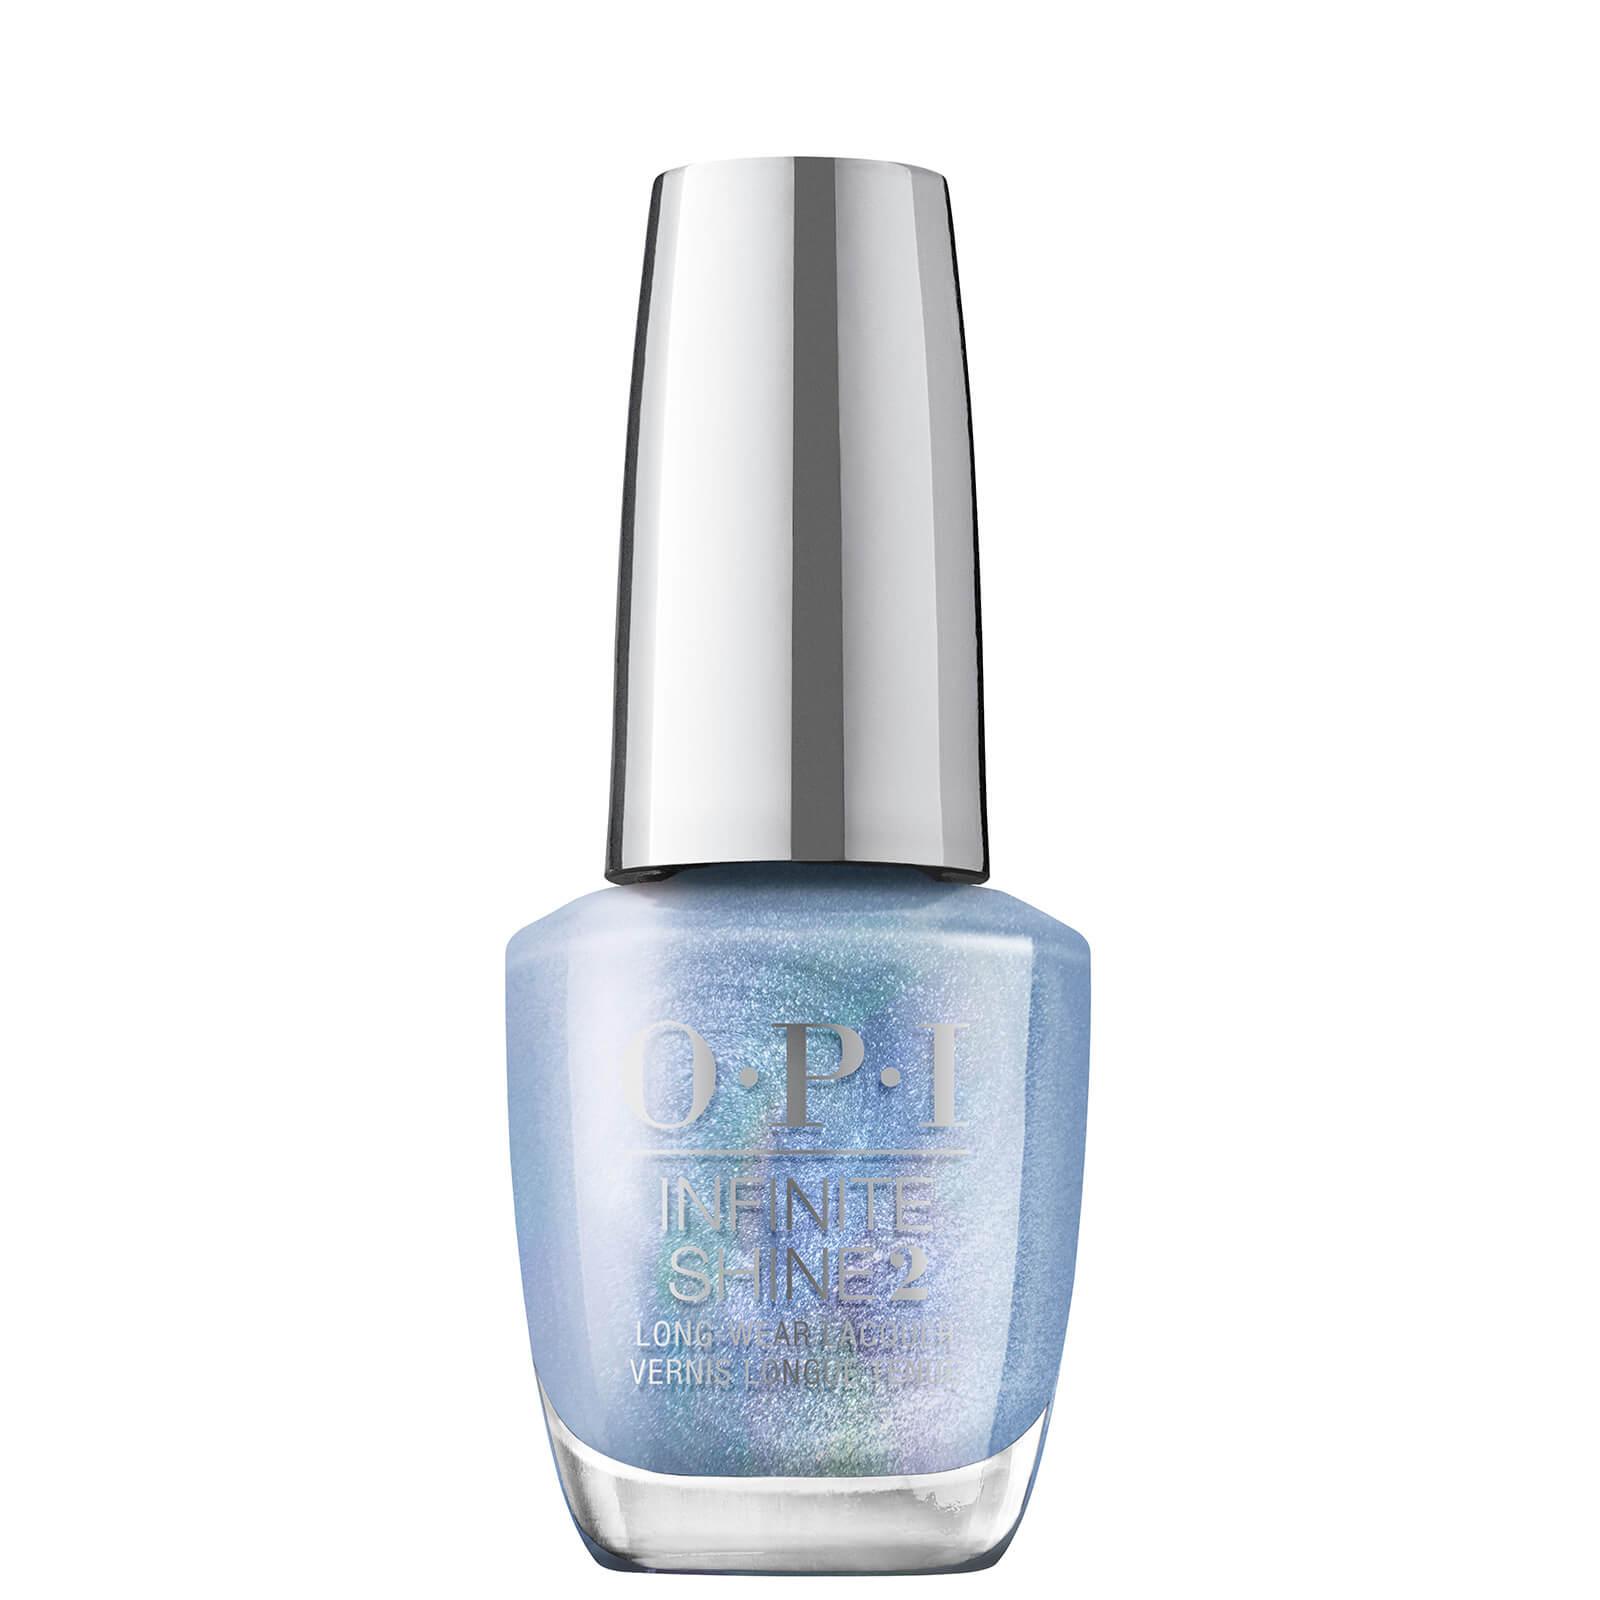 Купить OPI DTLA Collection Infinite Shine Long-wear Nail Polish 15ml (Various Shades) - Angels Flight to Starry Nights